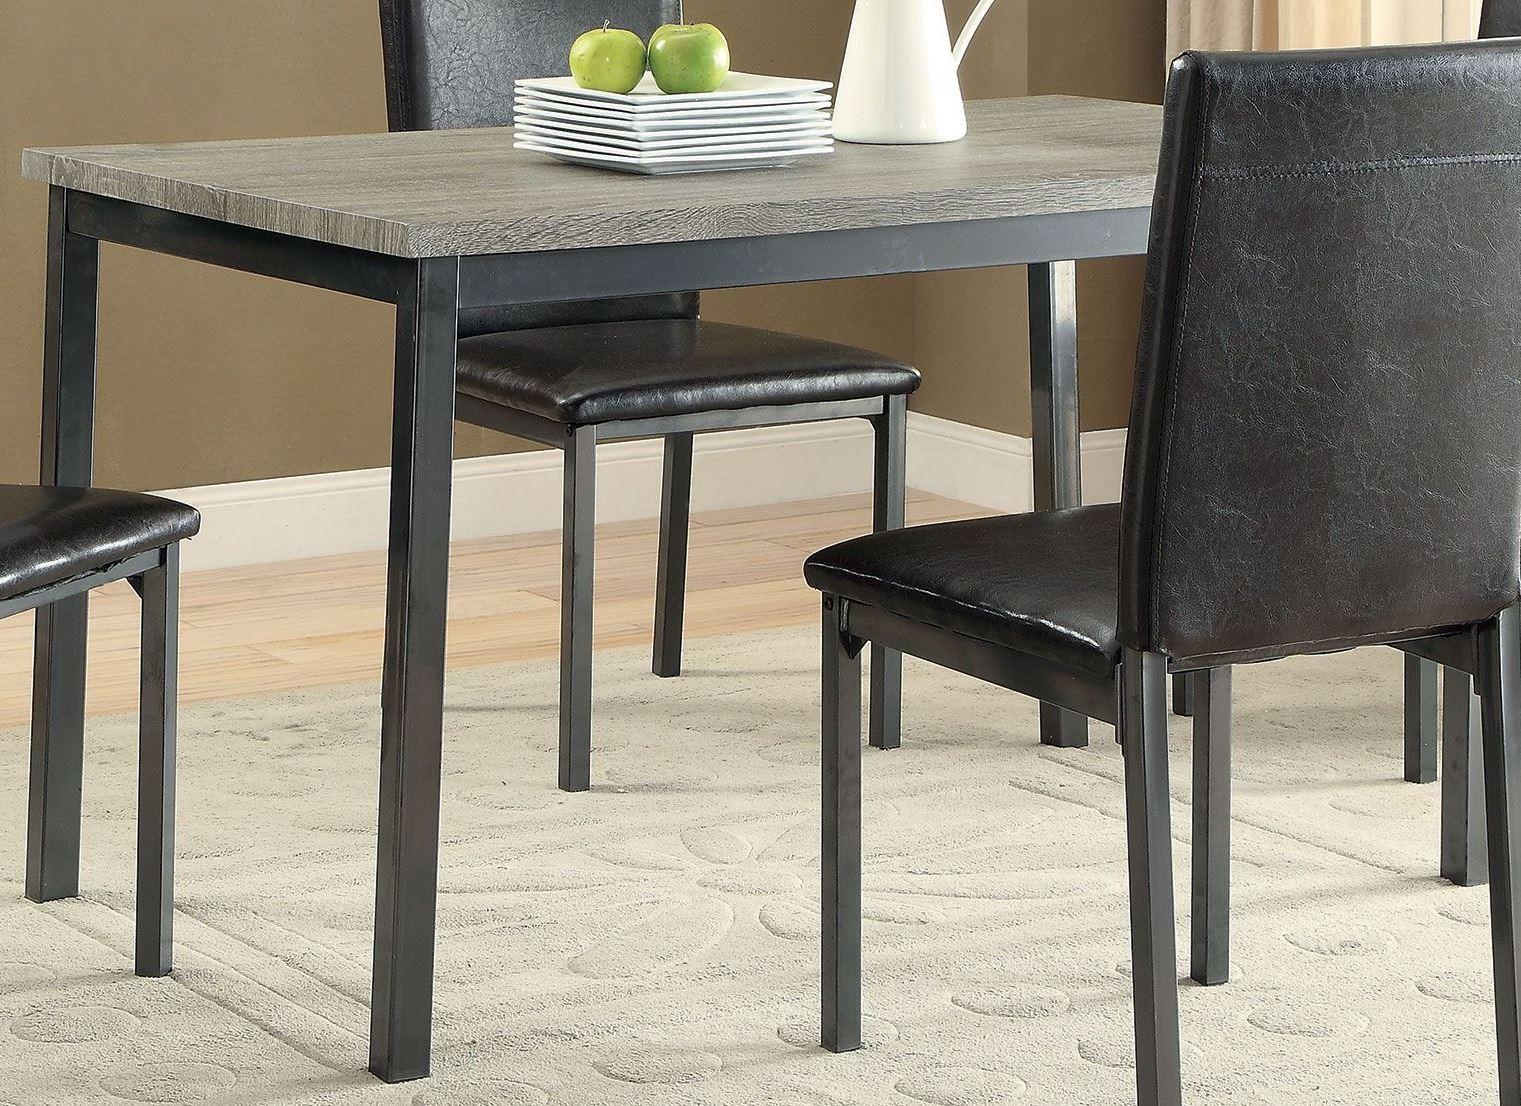 garza black dining table from coaster coleman furniture. Black Bedroom Furniture Sets. Home Design Ideas